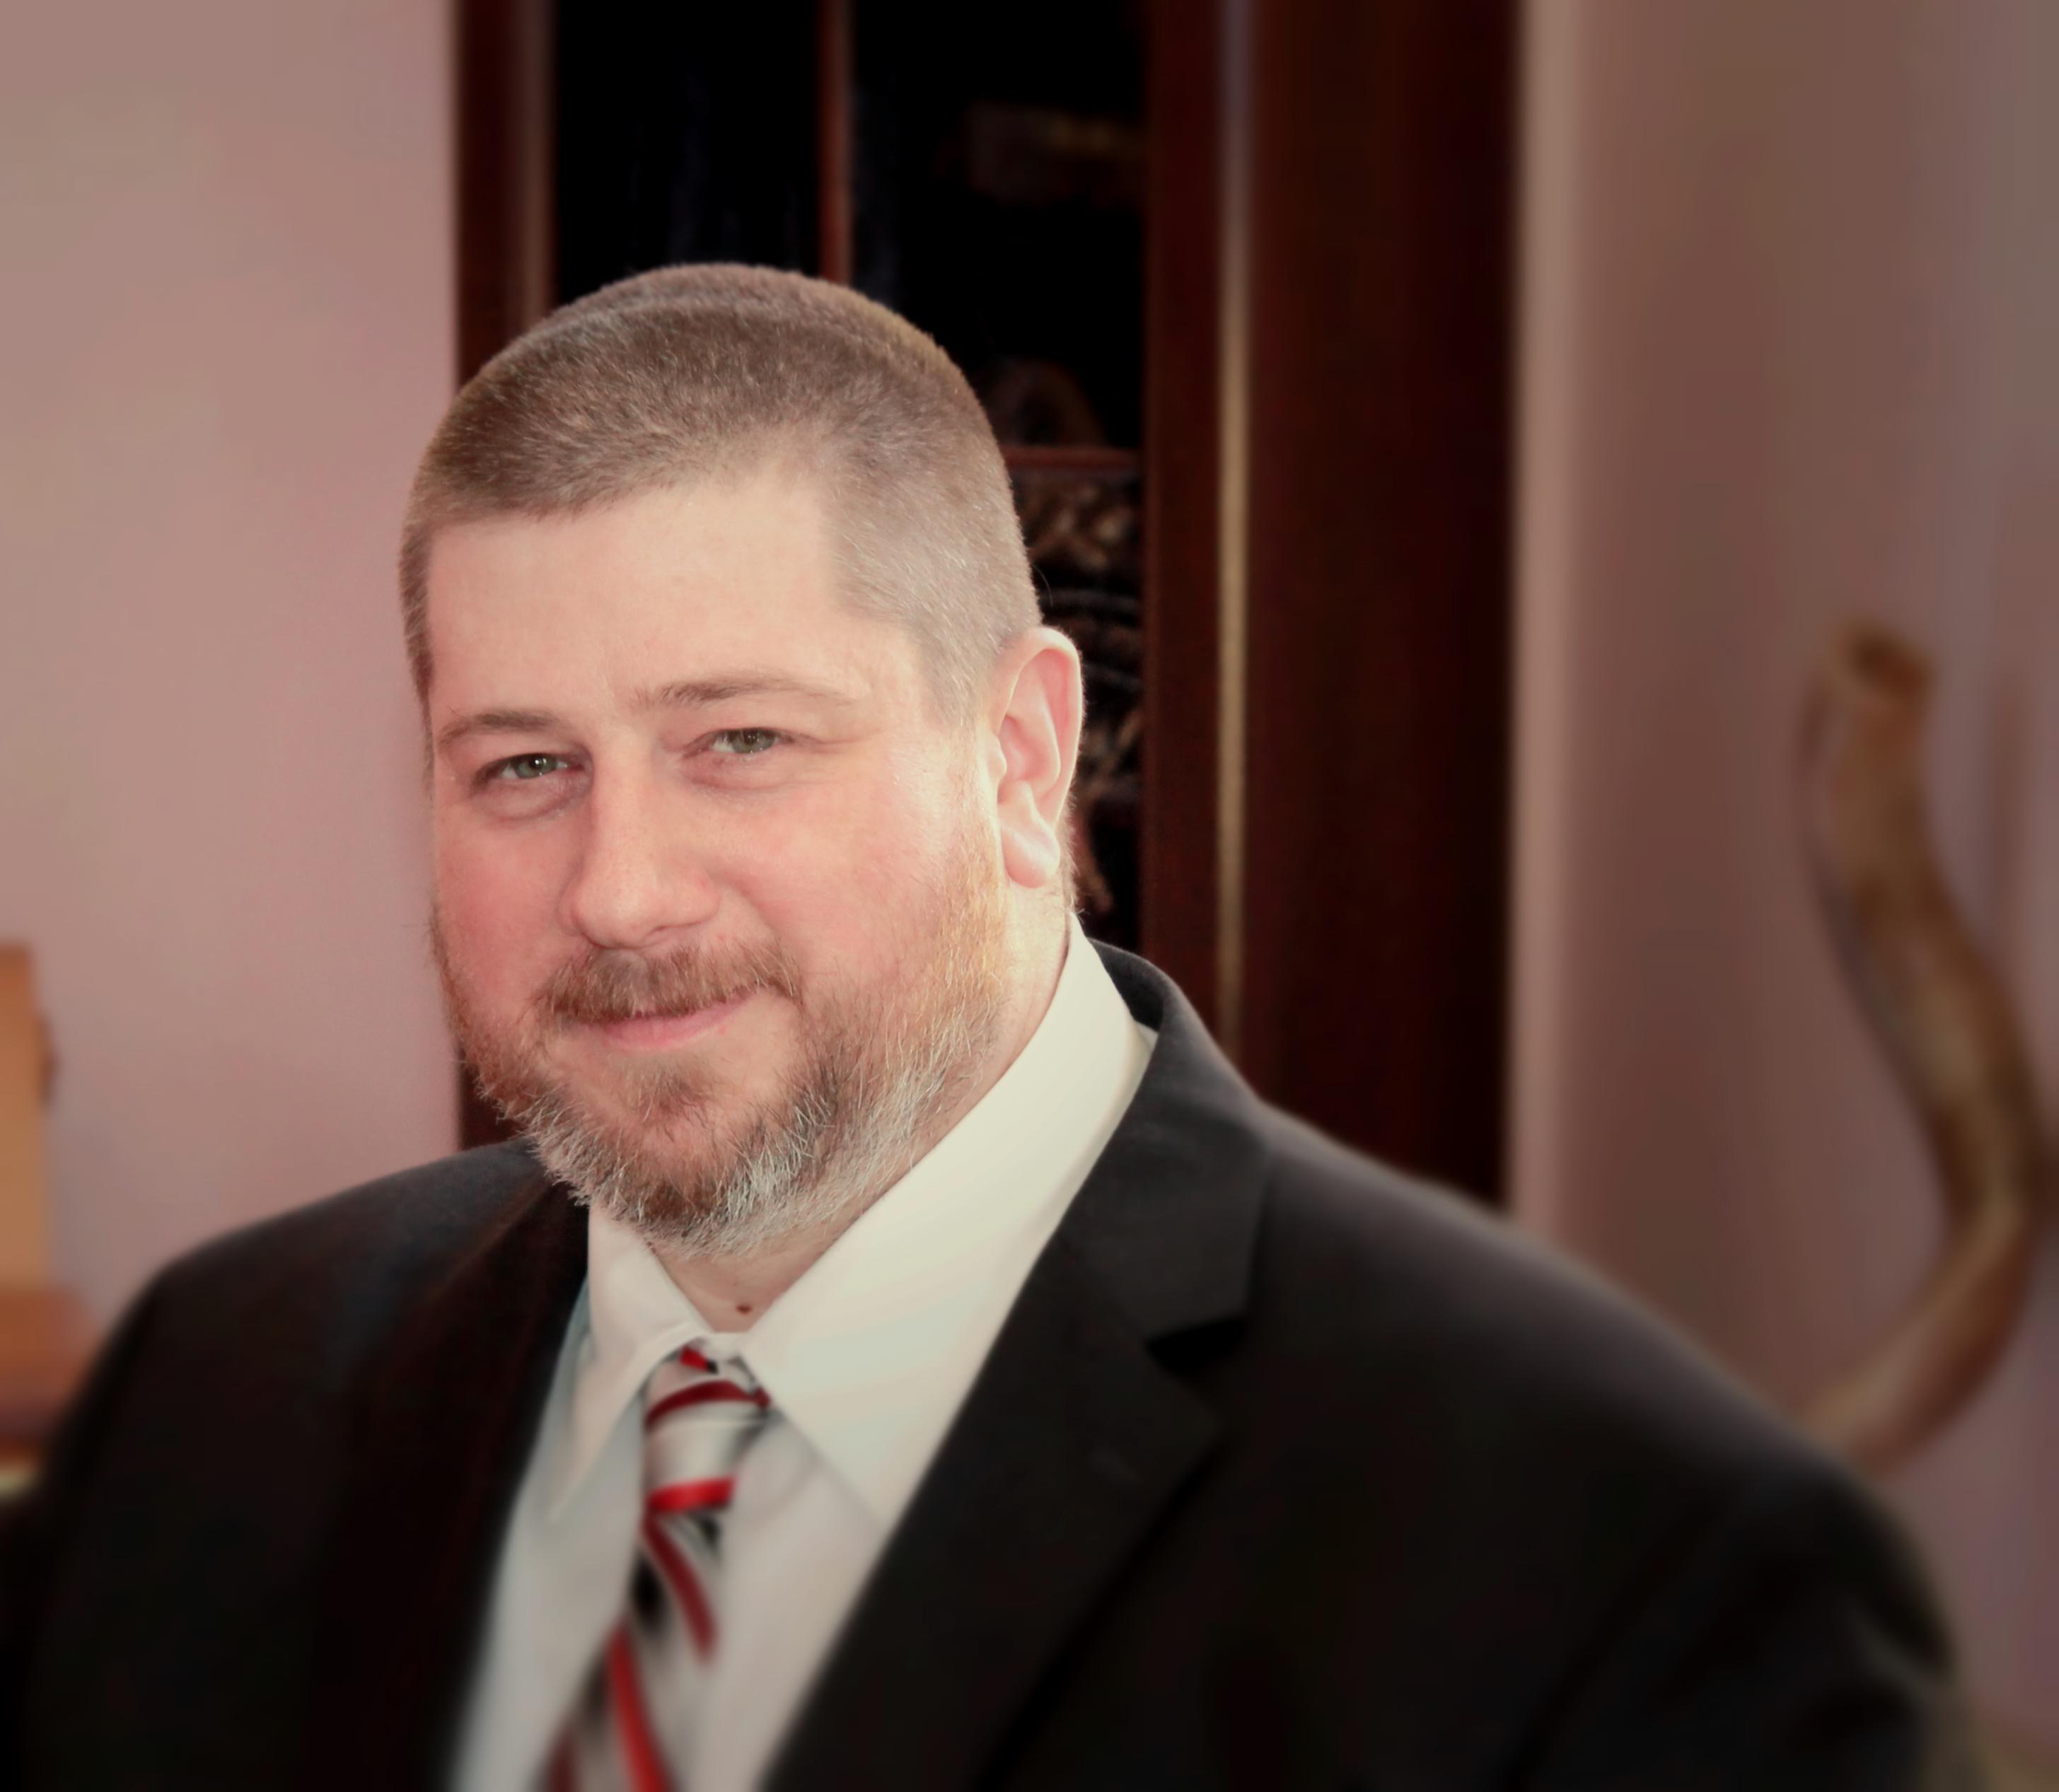 Rabbi Justin Elwell